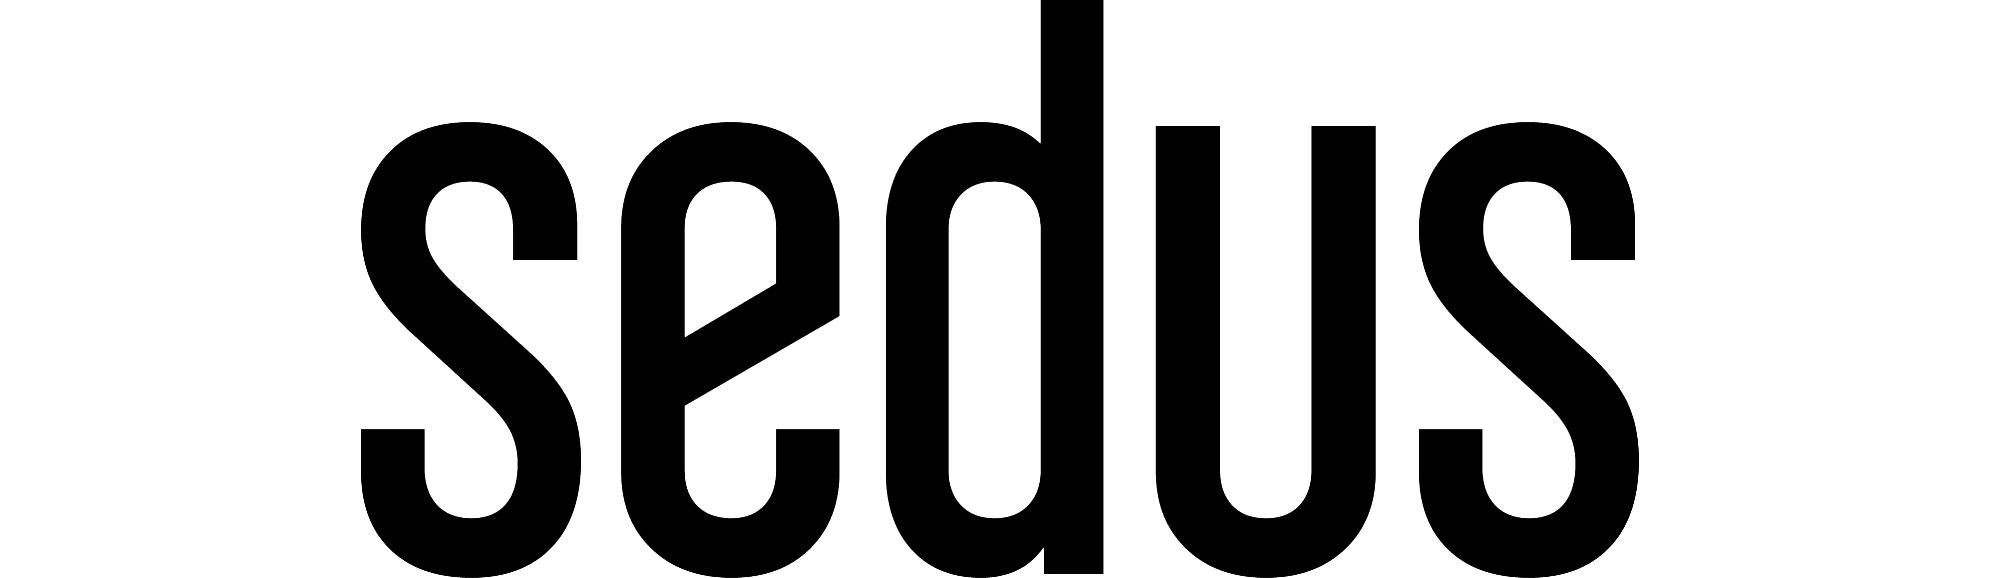 Sedus Systems